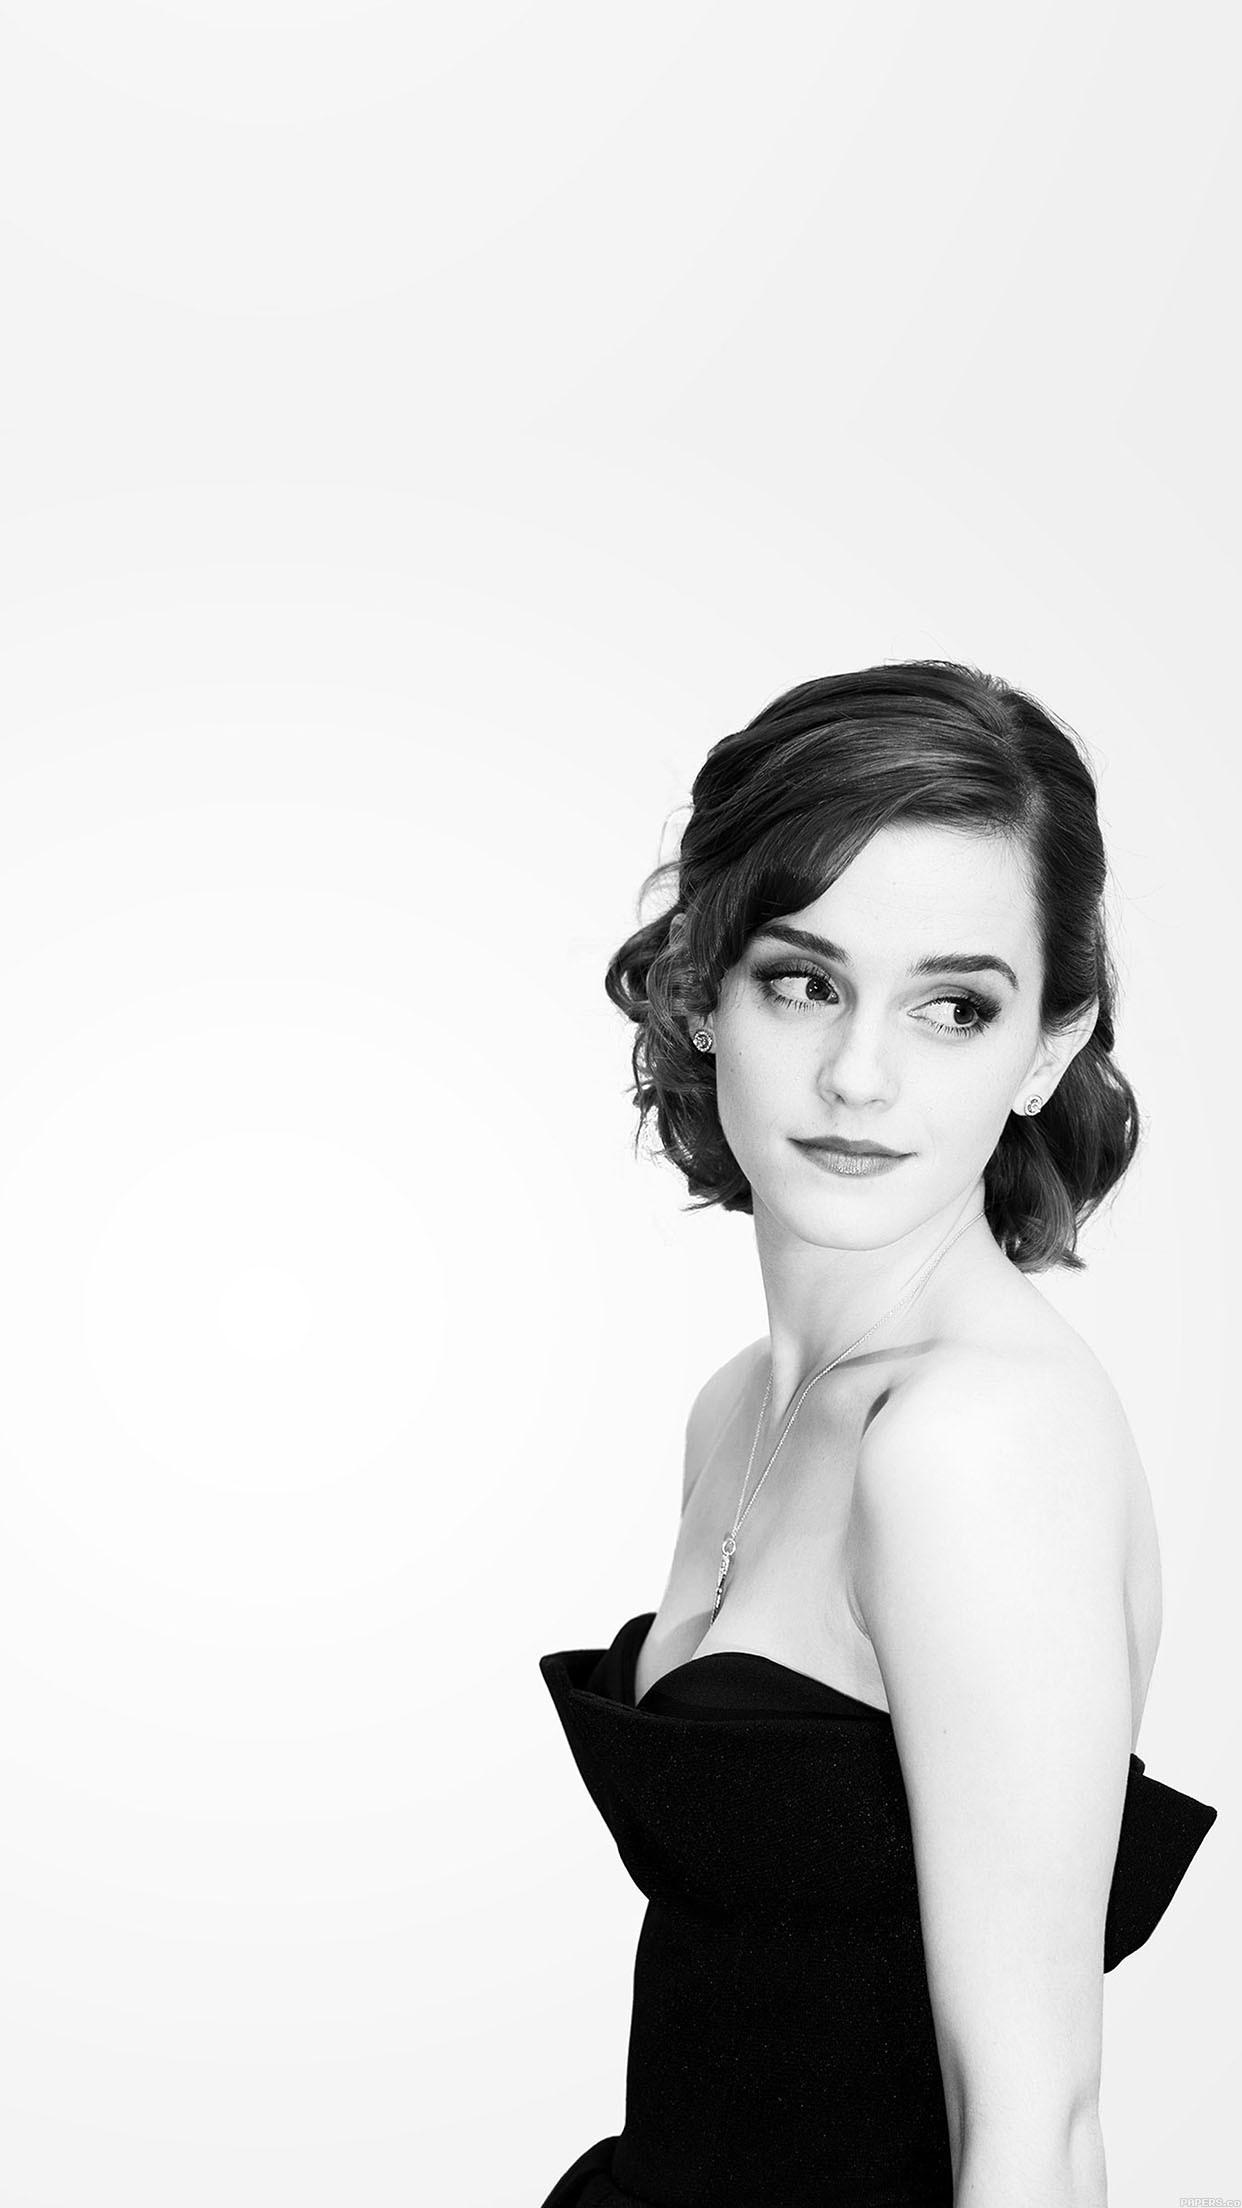 Emma Watson Iphone Images - Emma Watson Wallpaper Iphone , HD Wallpaper & Backgrounds